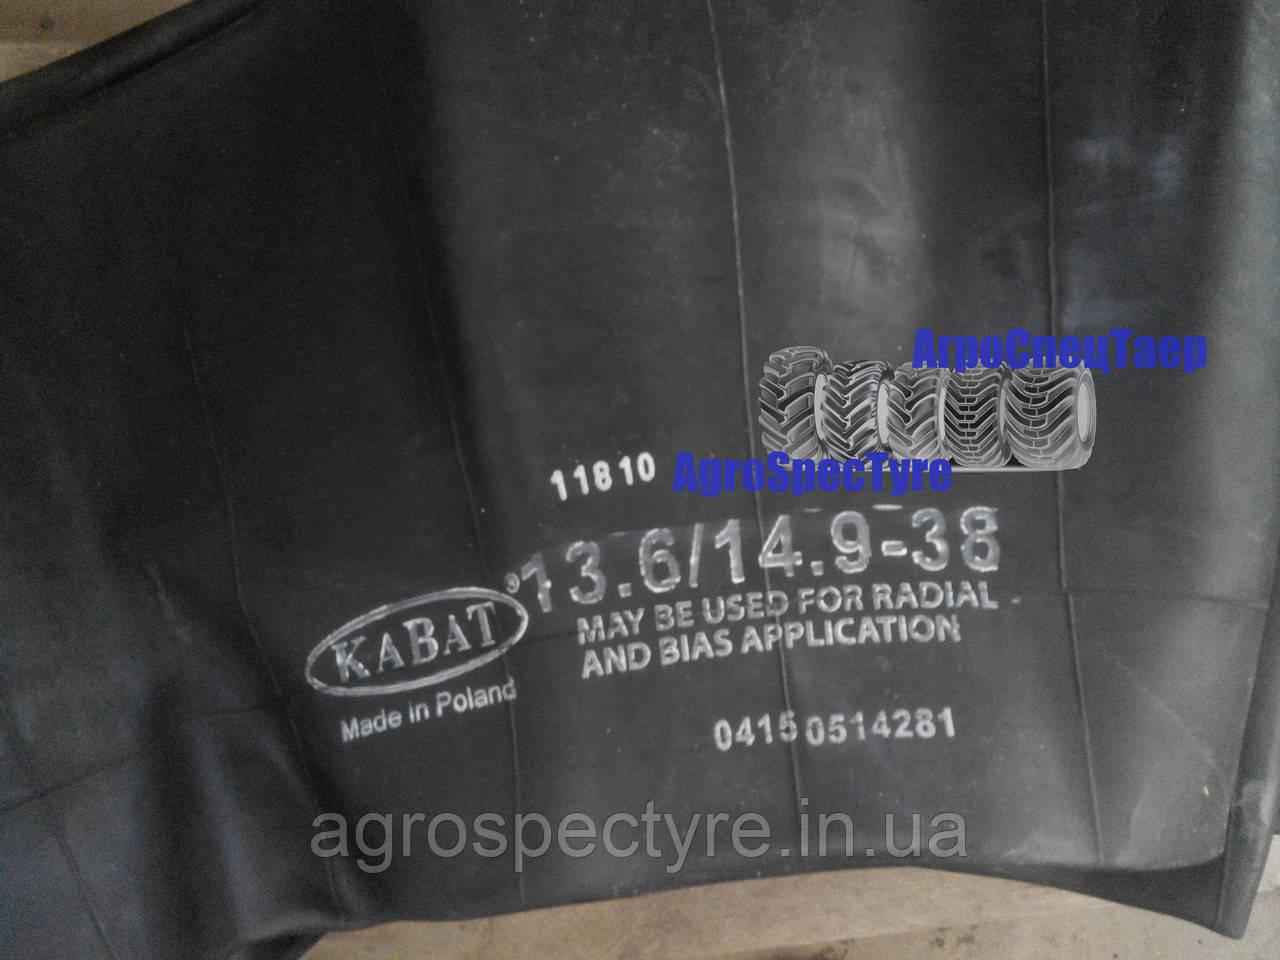 Камера 13.6/14.9-38 TR-218A KABAT на трактор Т 40 МТЗ